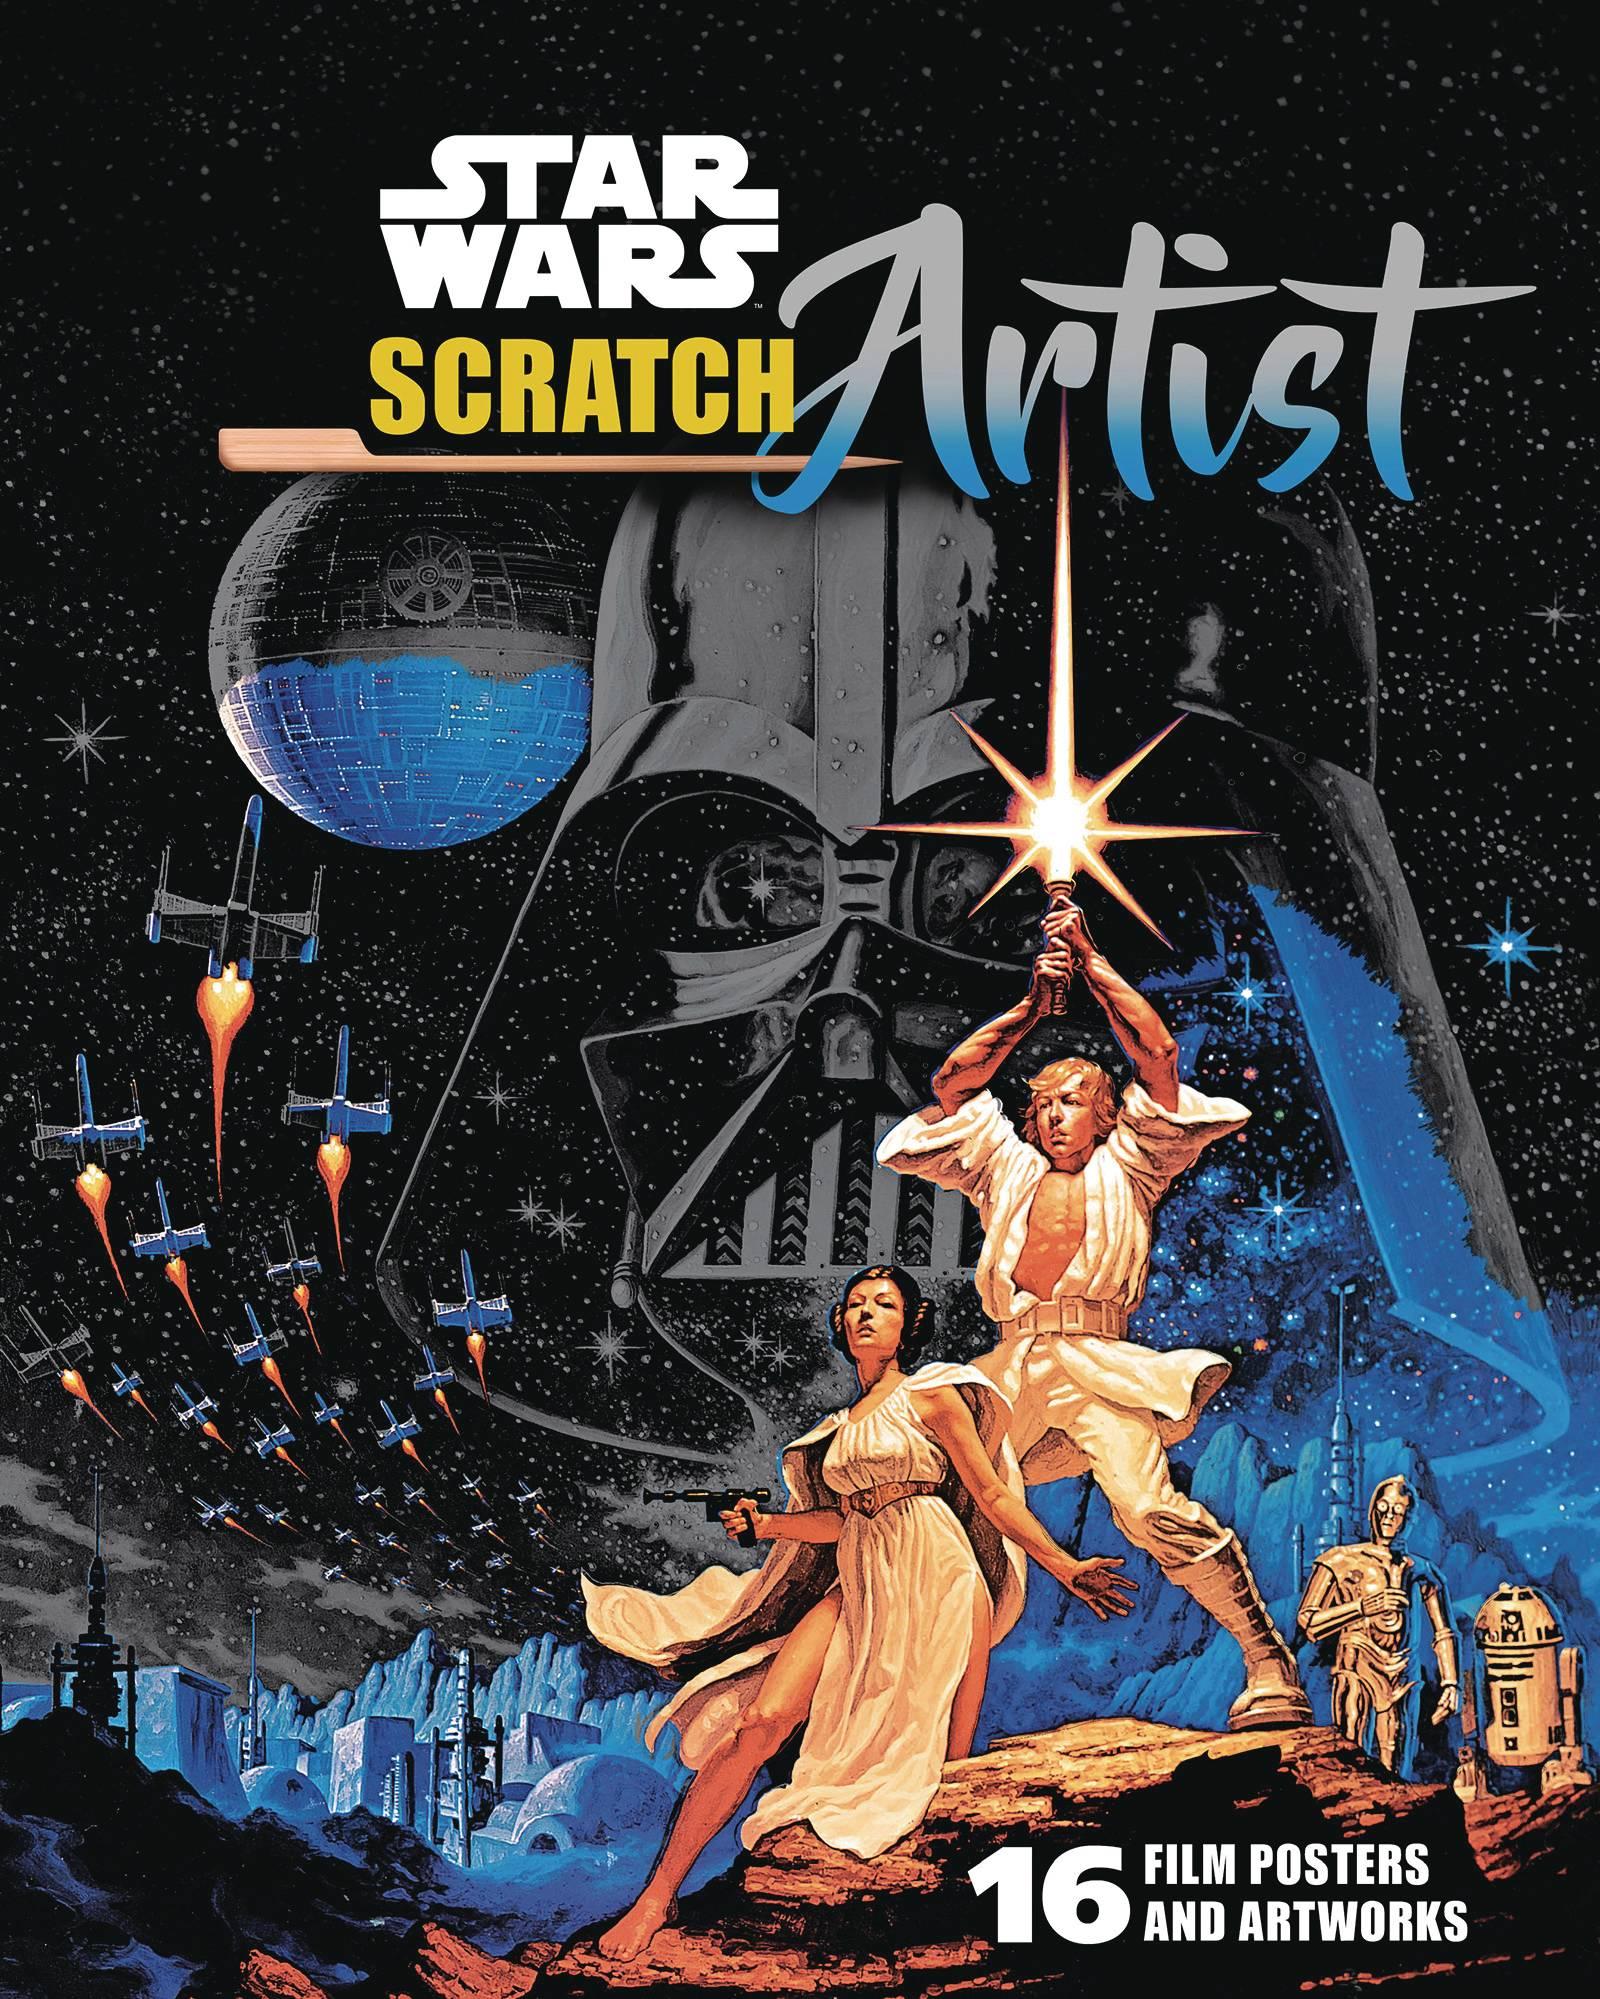 STAR WARS SCRATCH ARTIST CLASSIC MOVIE POSTERS